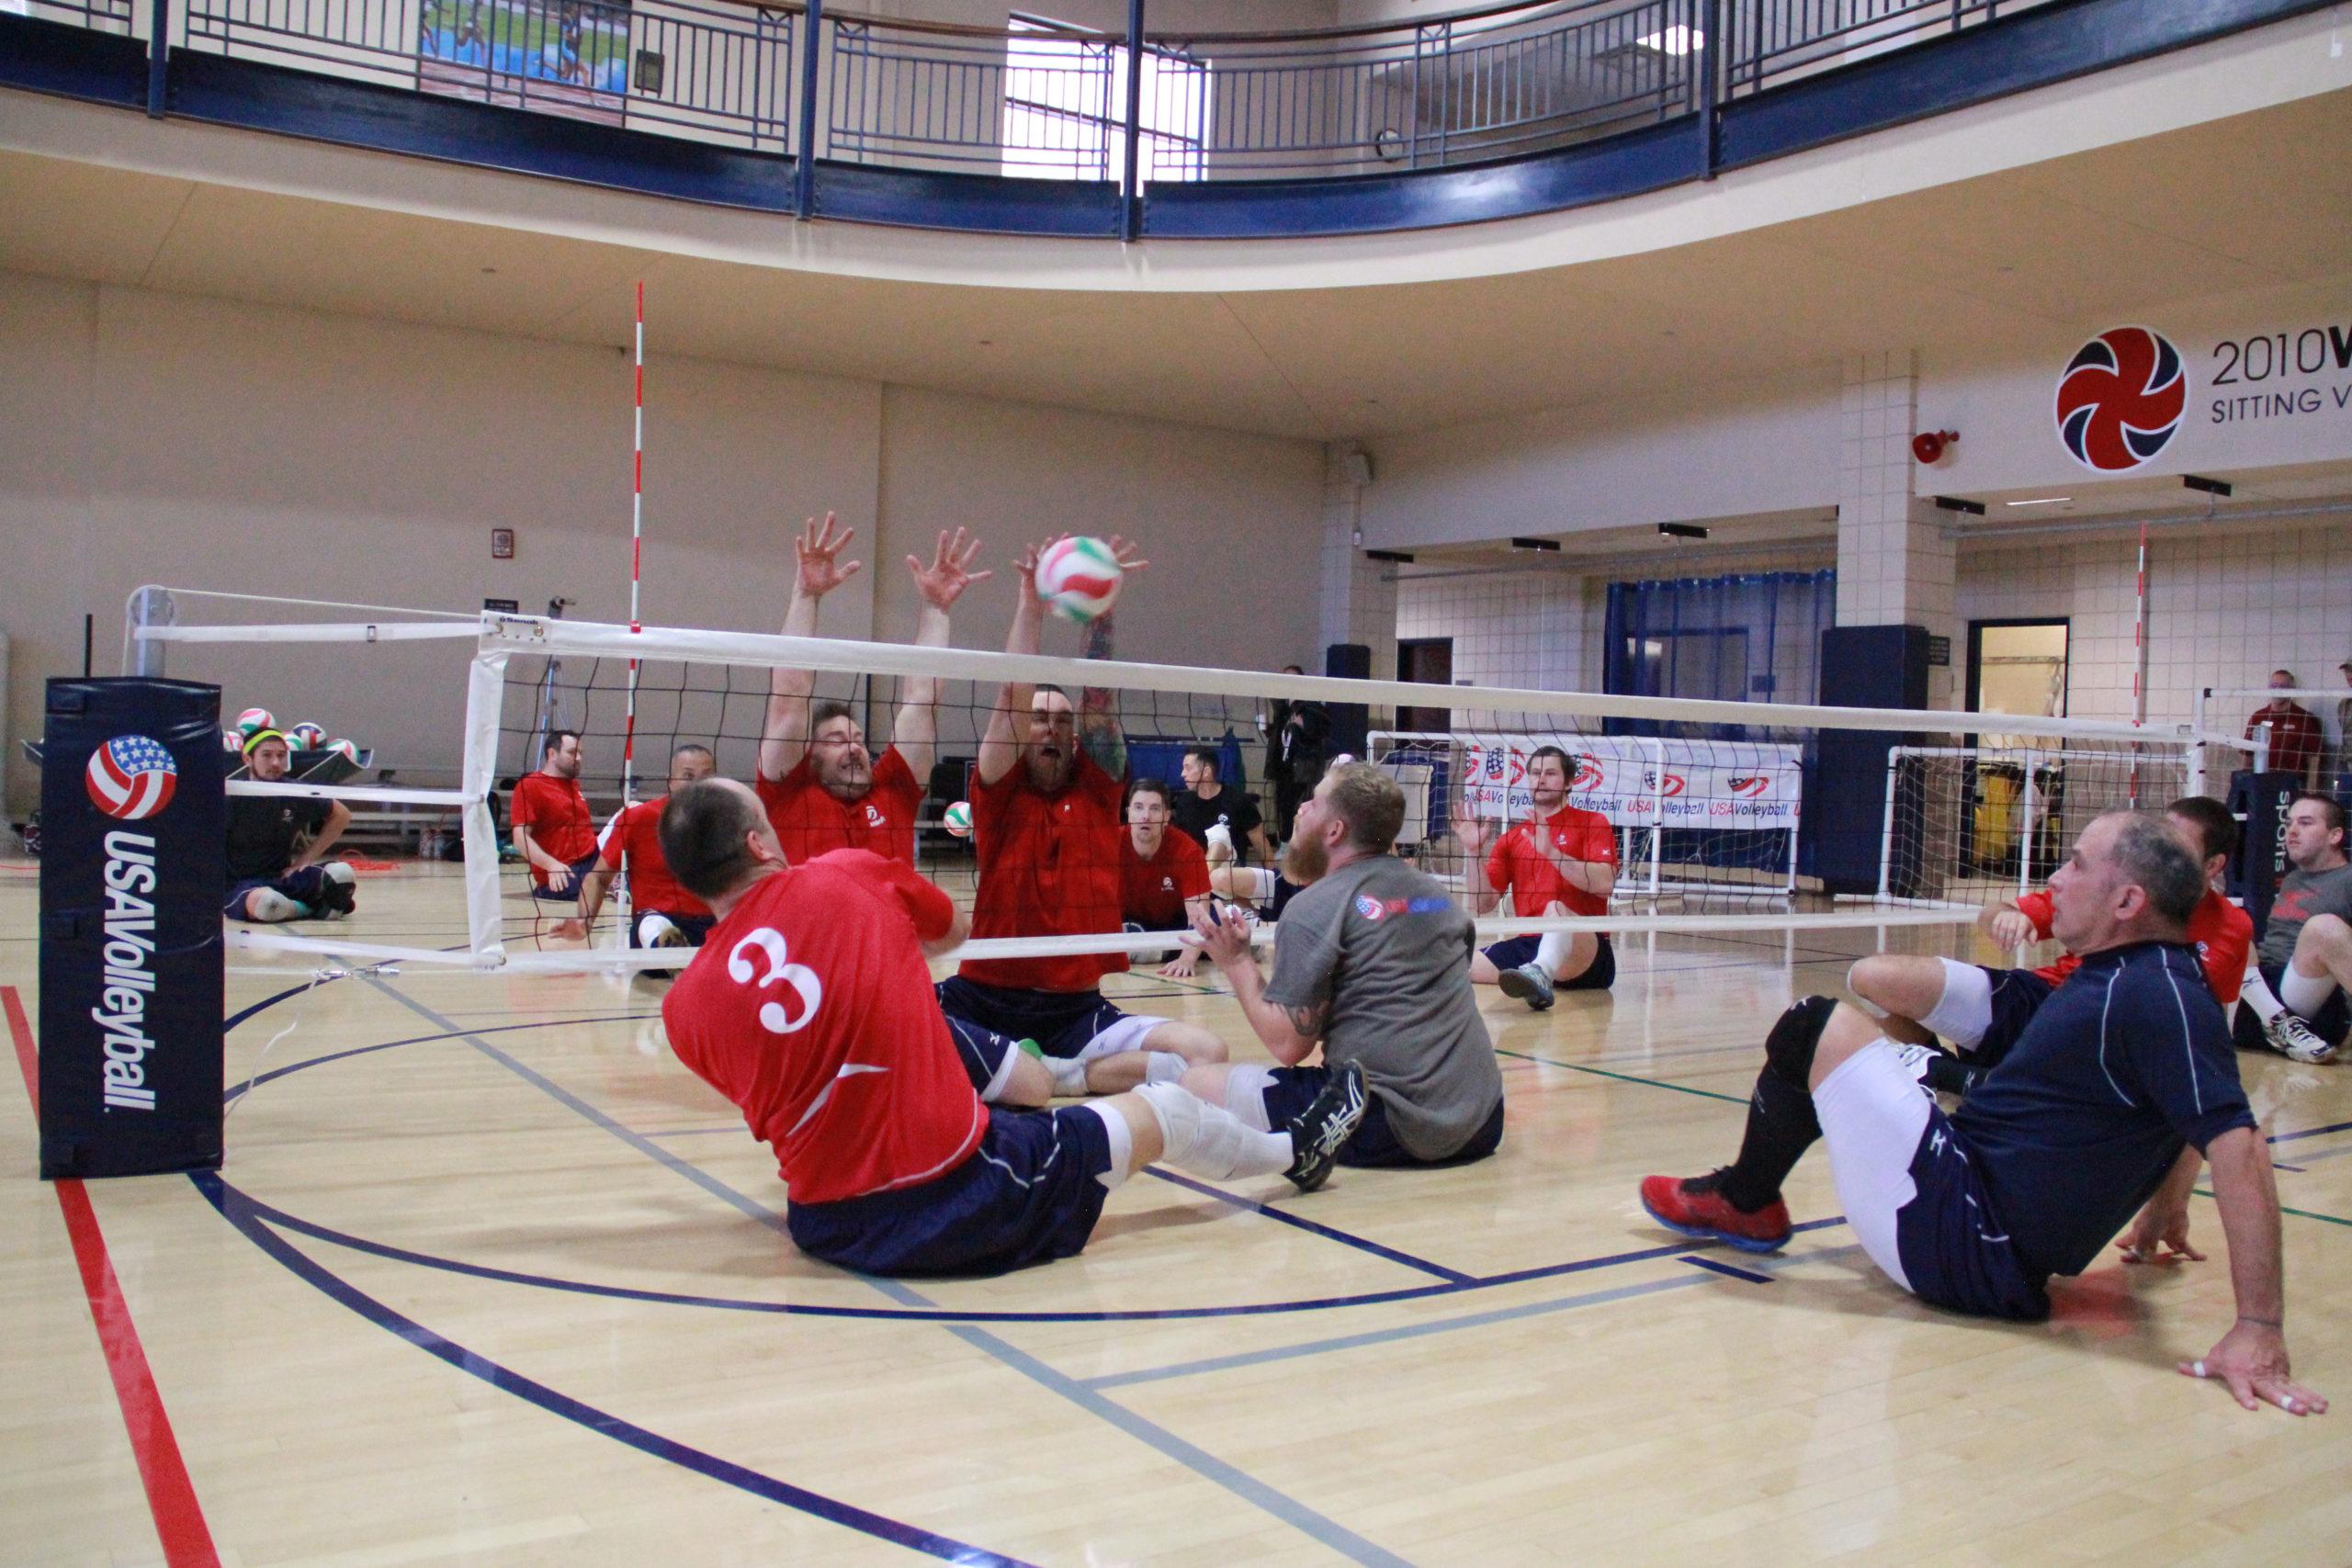 Sitting Volleyball Equipment